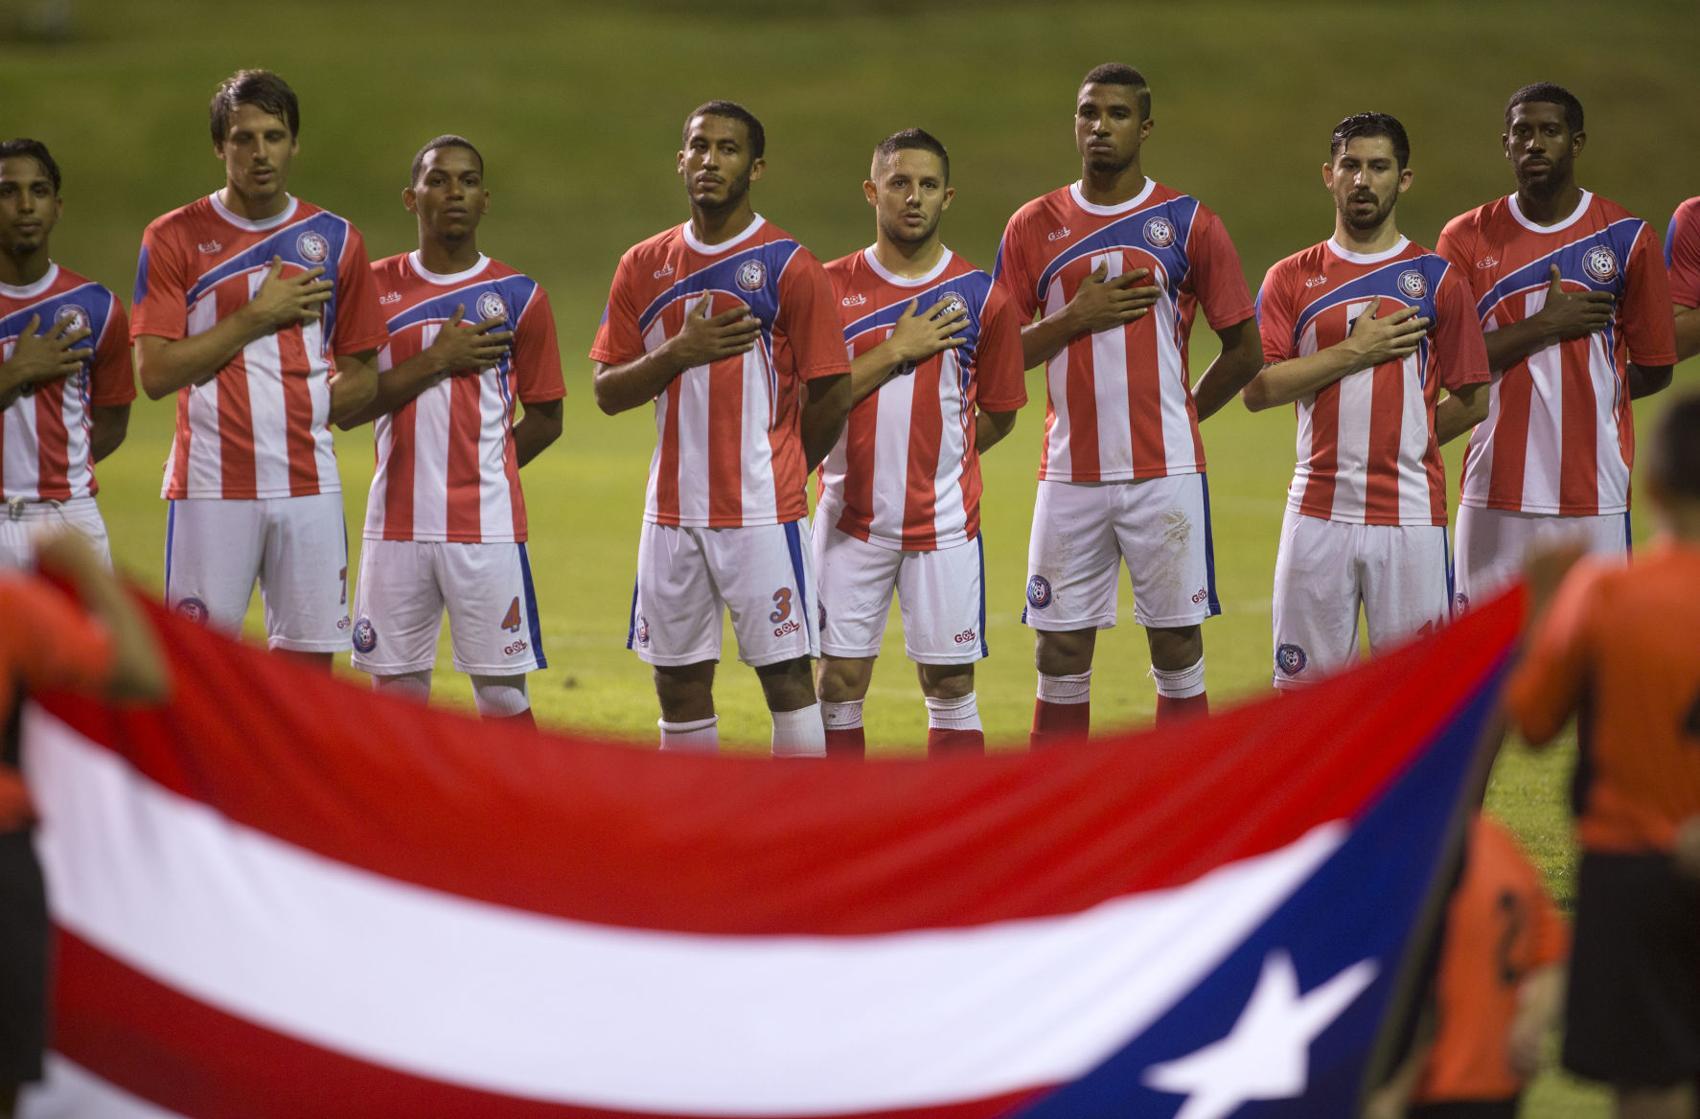 Liga Nacional de Fútbol de Puerto Rico